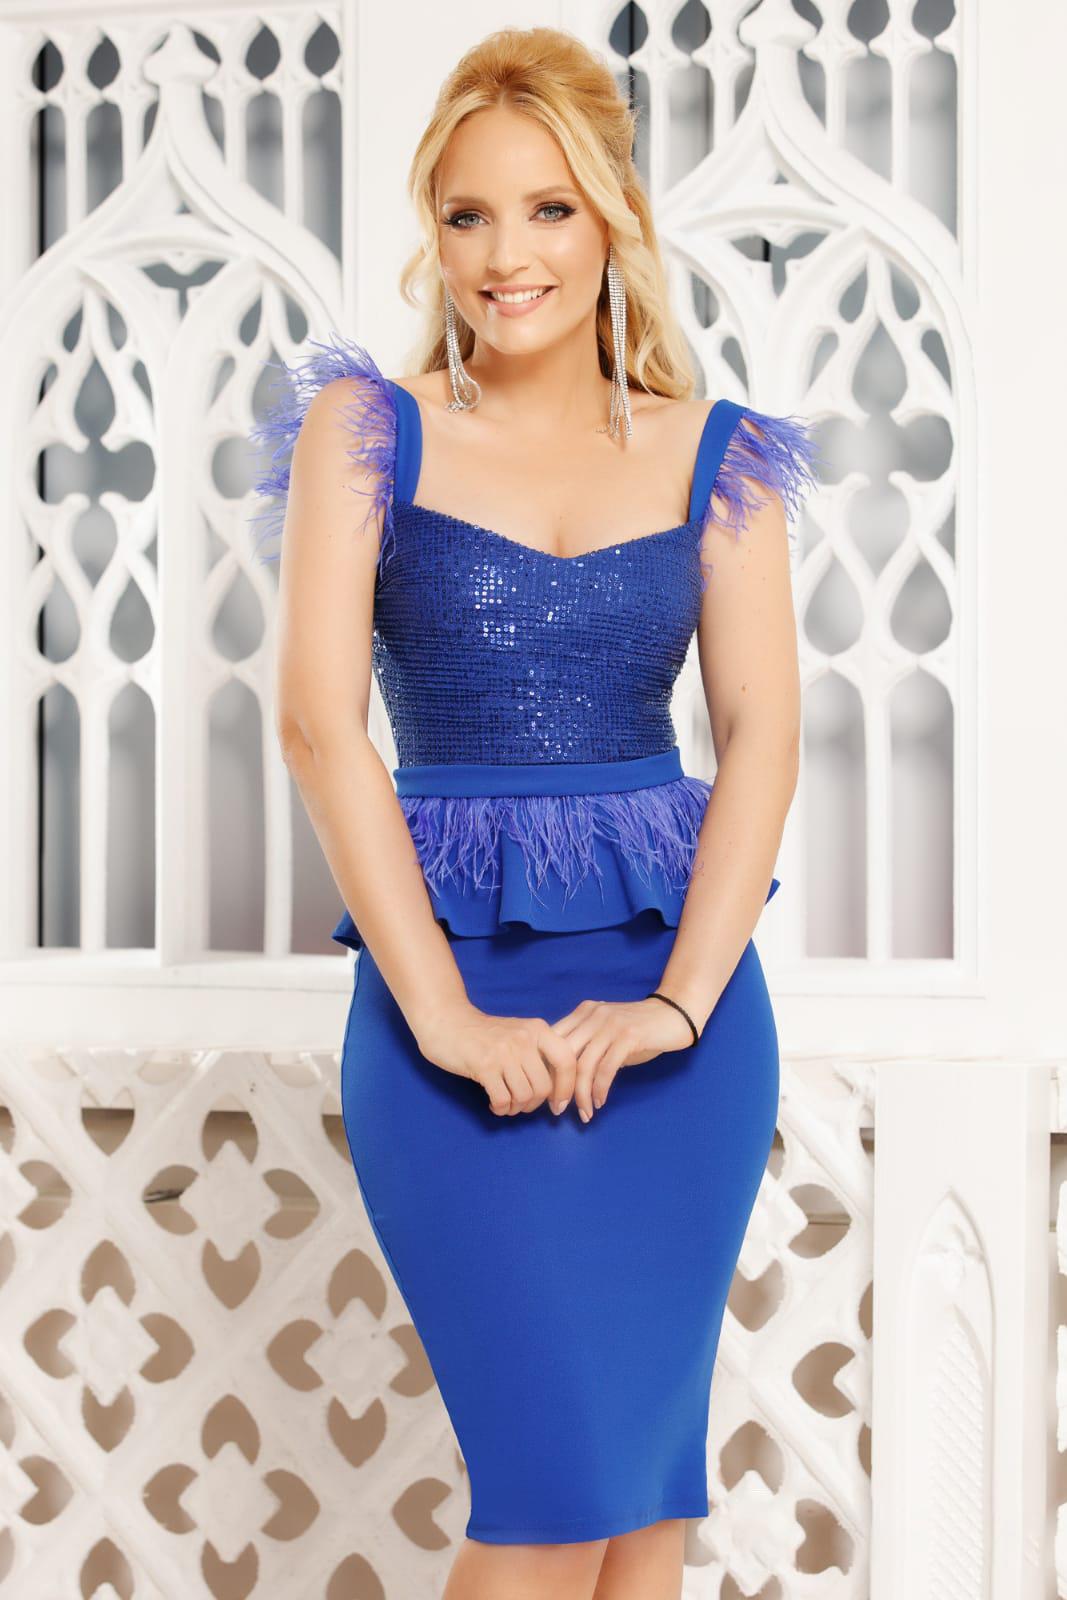 Rochie Fofy albastra eleganta de ocazie midi tip creion cu peplum cu decolteu adanc cu bretele